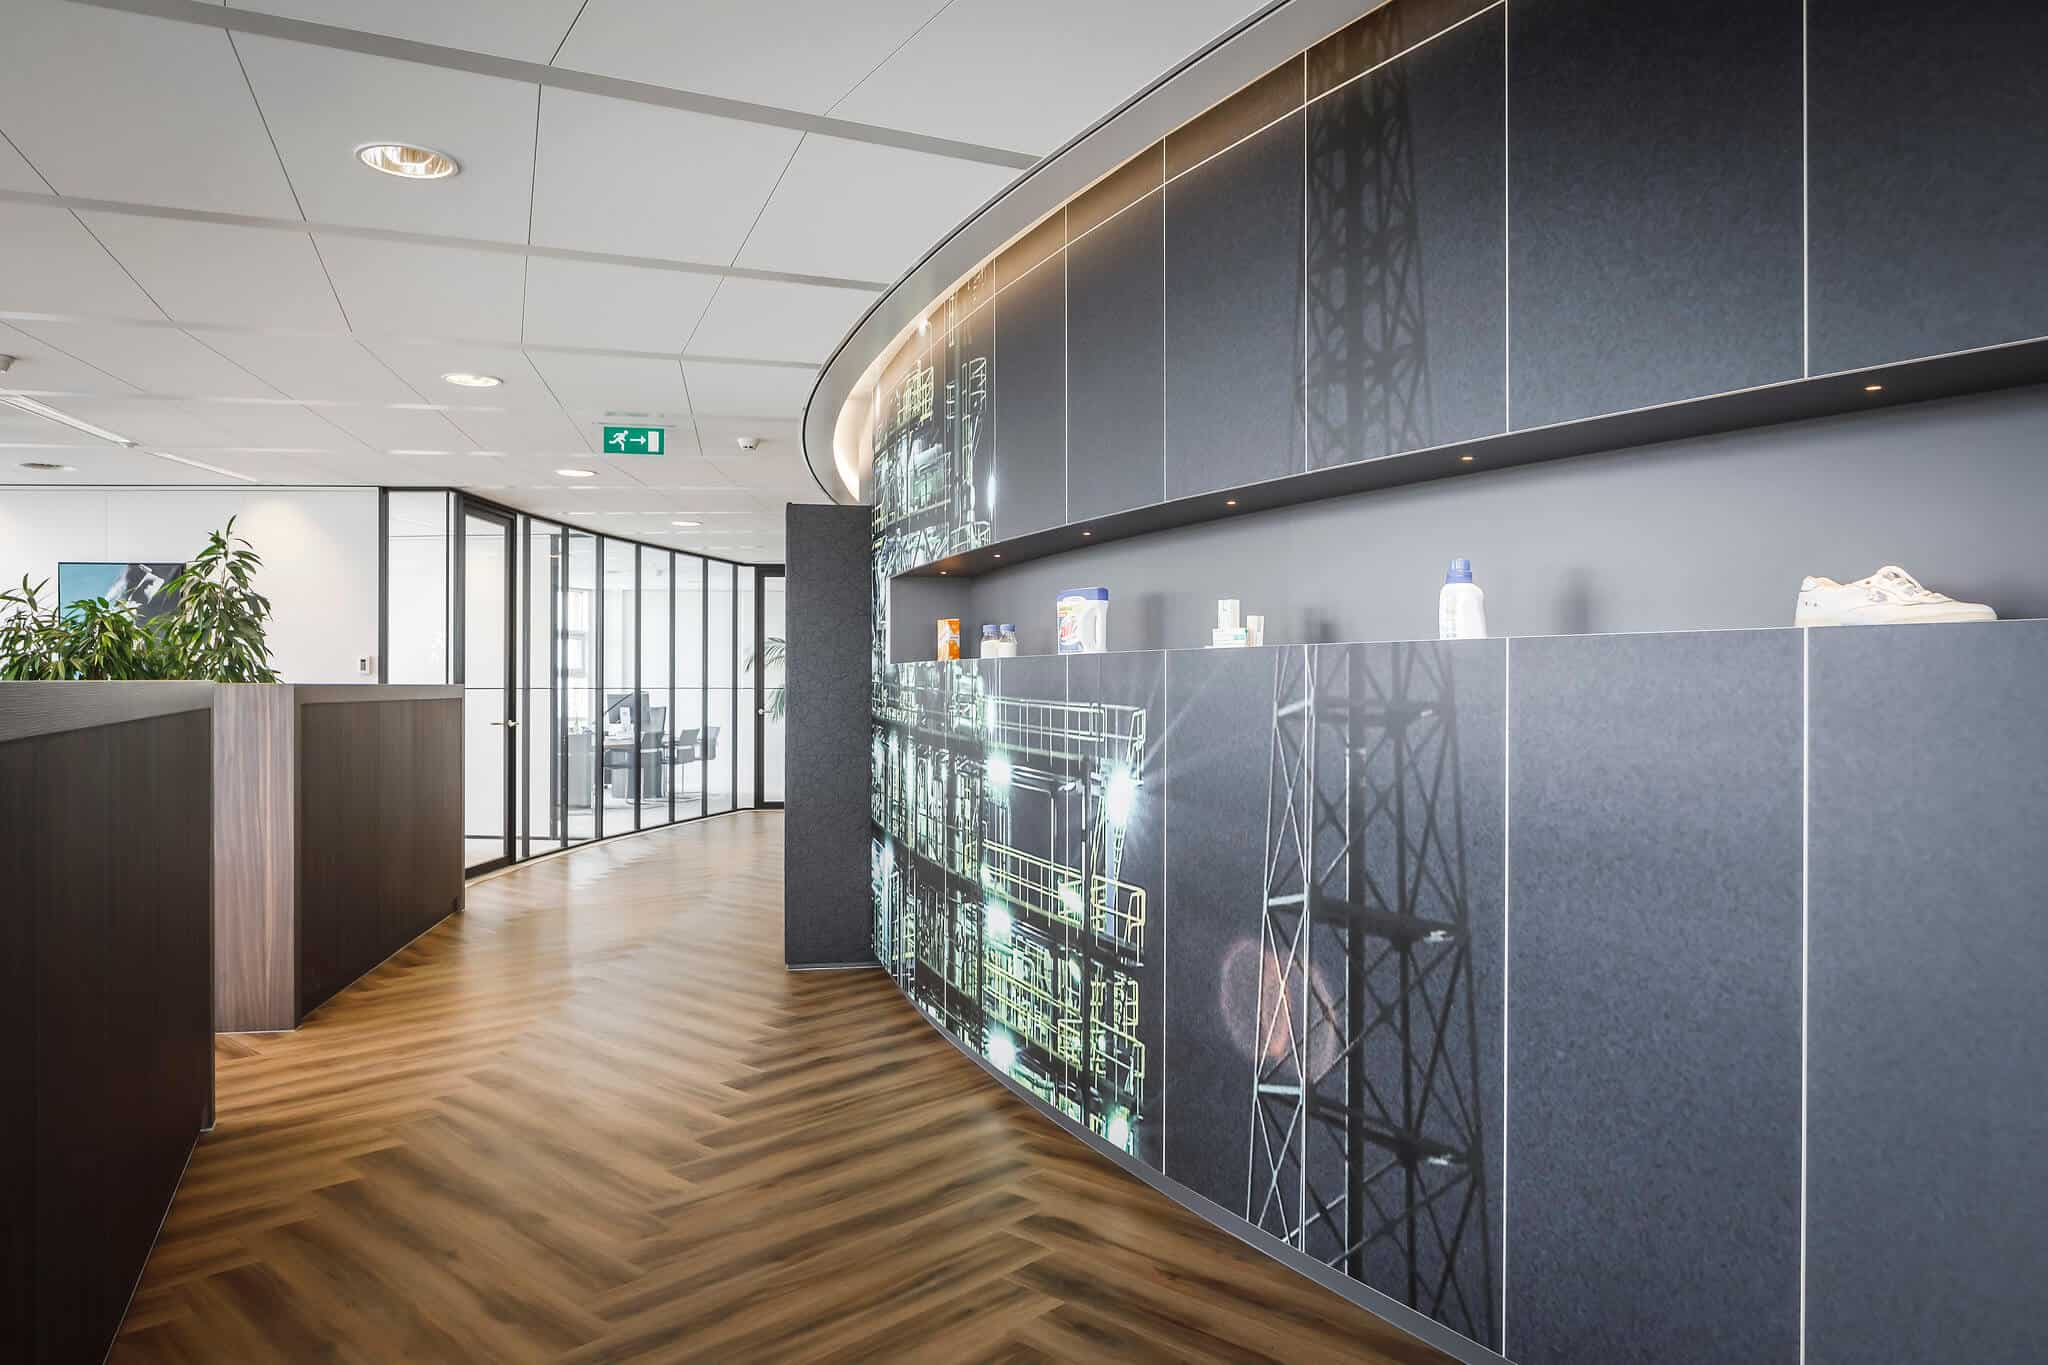 Wildenberg ontwerpt kantoor Delamine indirecte verlichting produktpresentatie